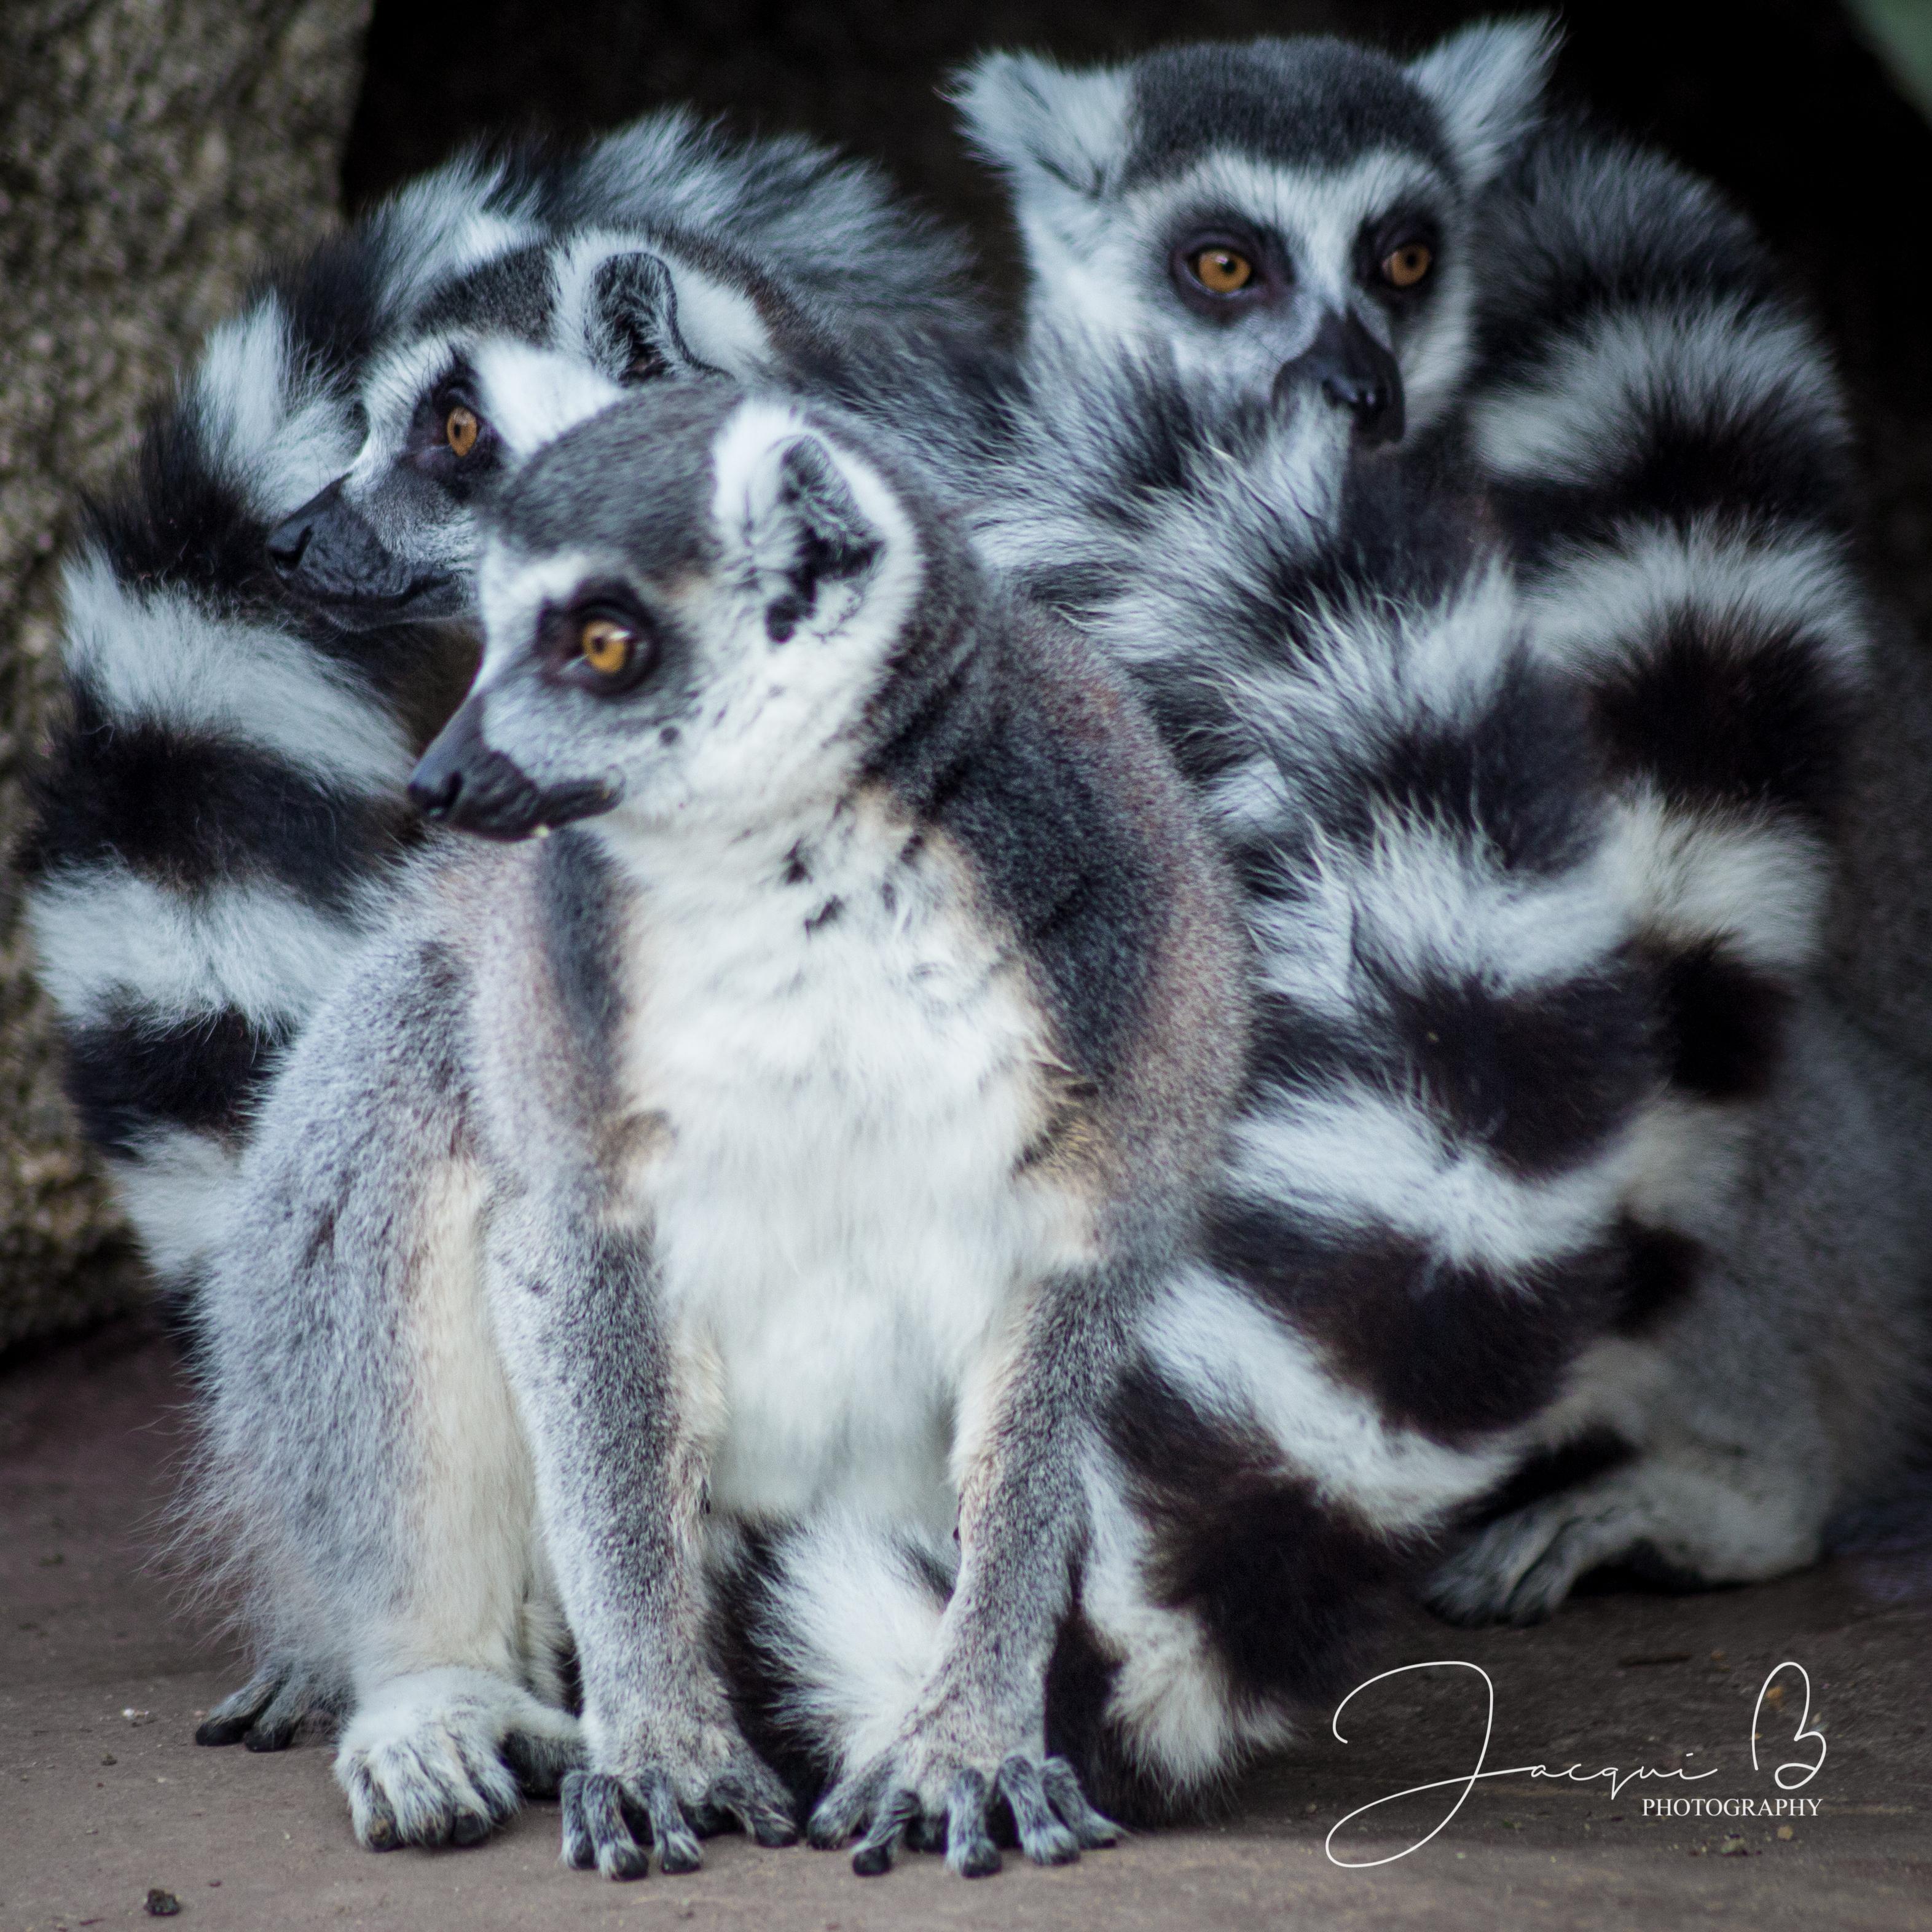 Jacqui B Photography Zoo-